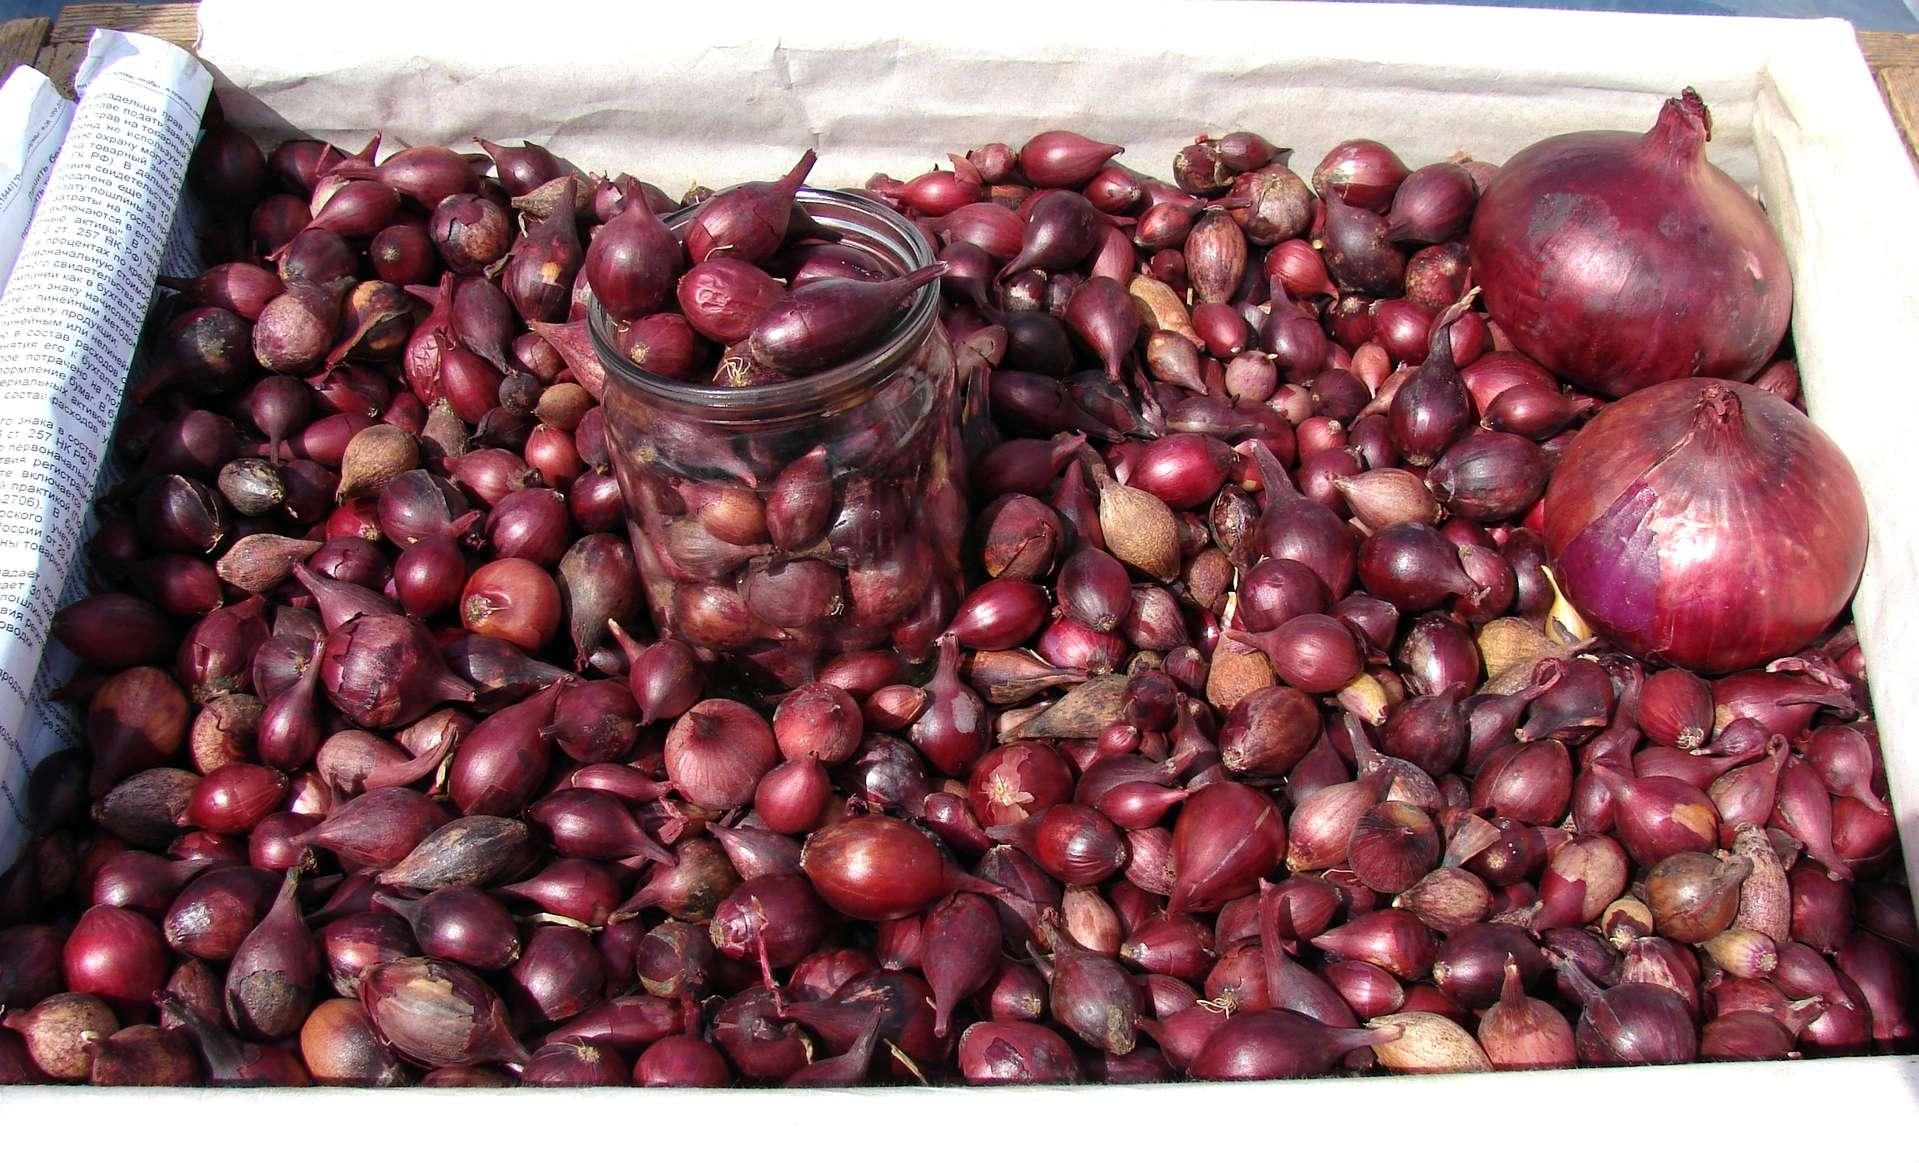 Как сажать лук севок под зиму? Преимущества посева под зиму